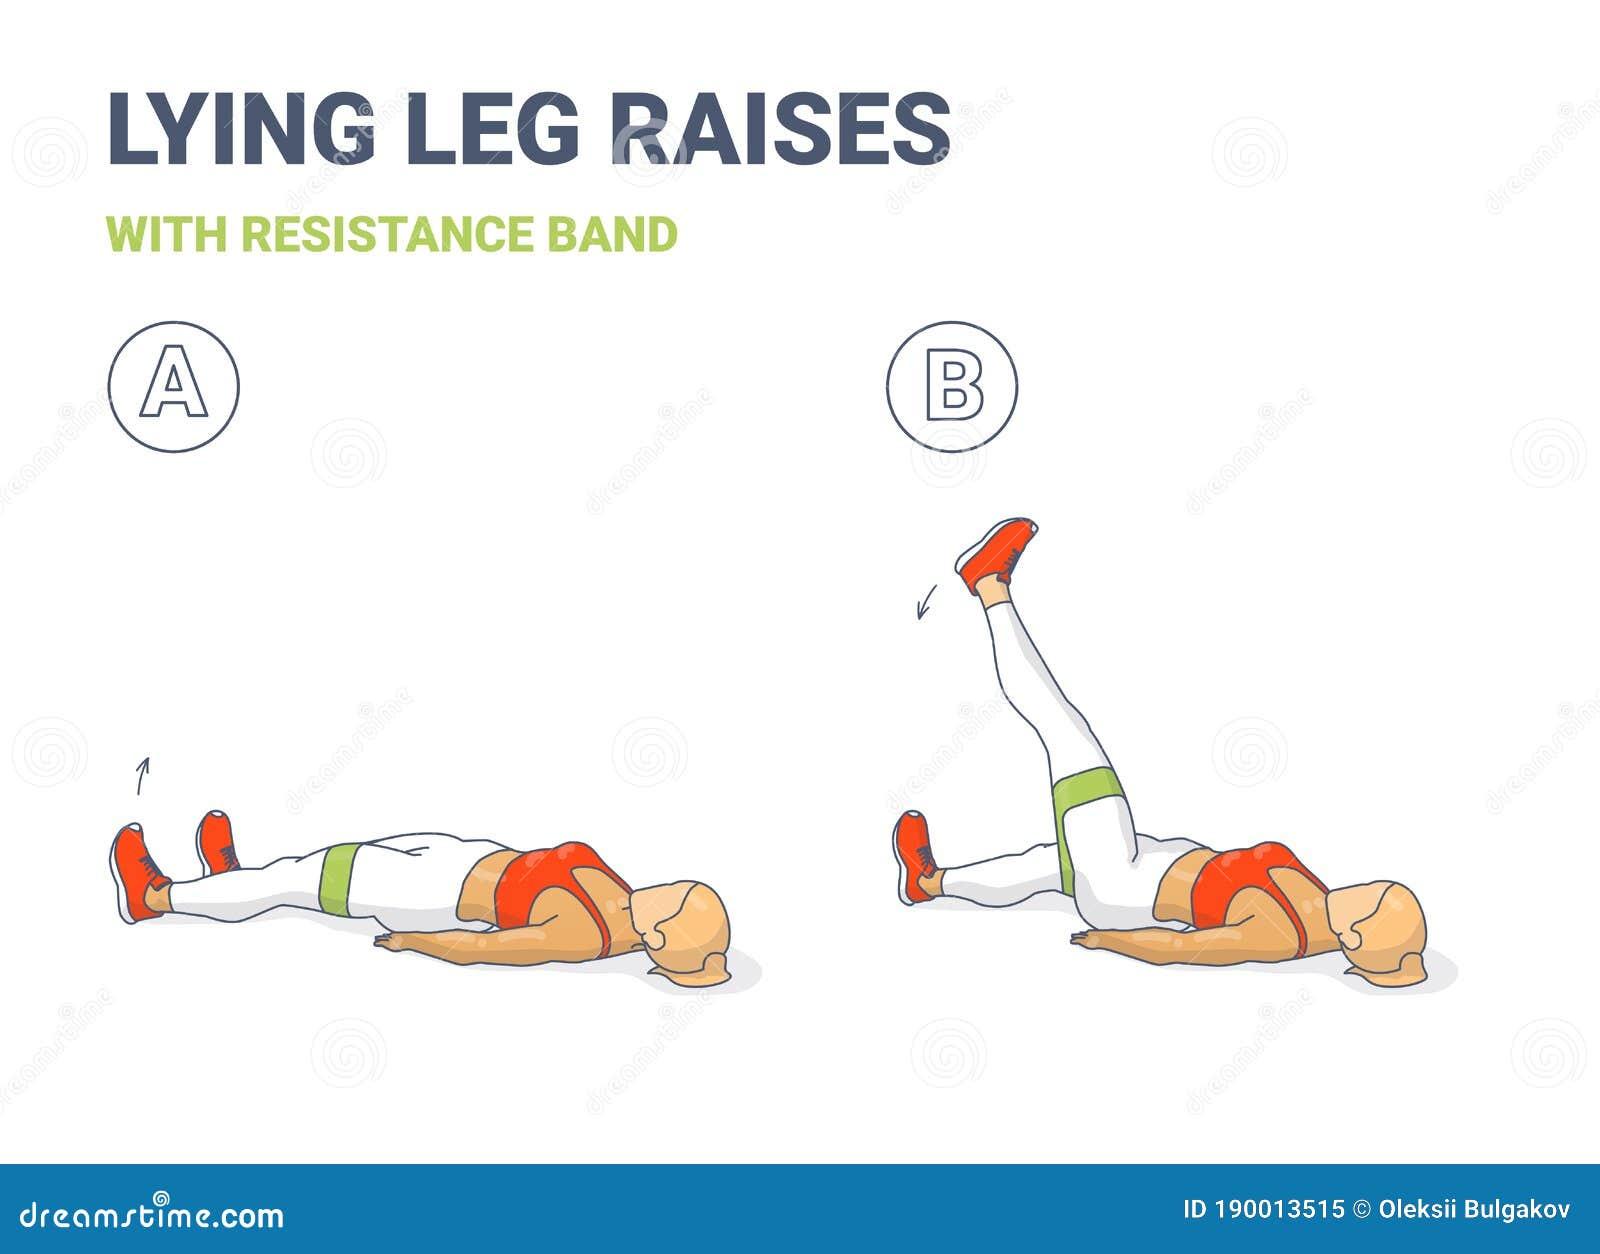 Lying Leg Lifting with Resistance Band Exercise Illustration ...